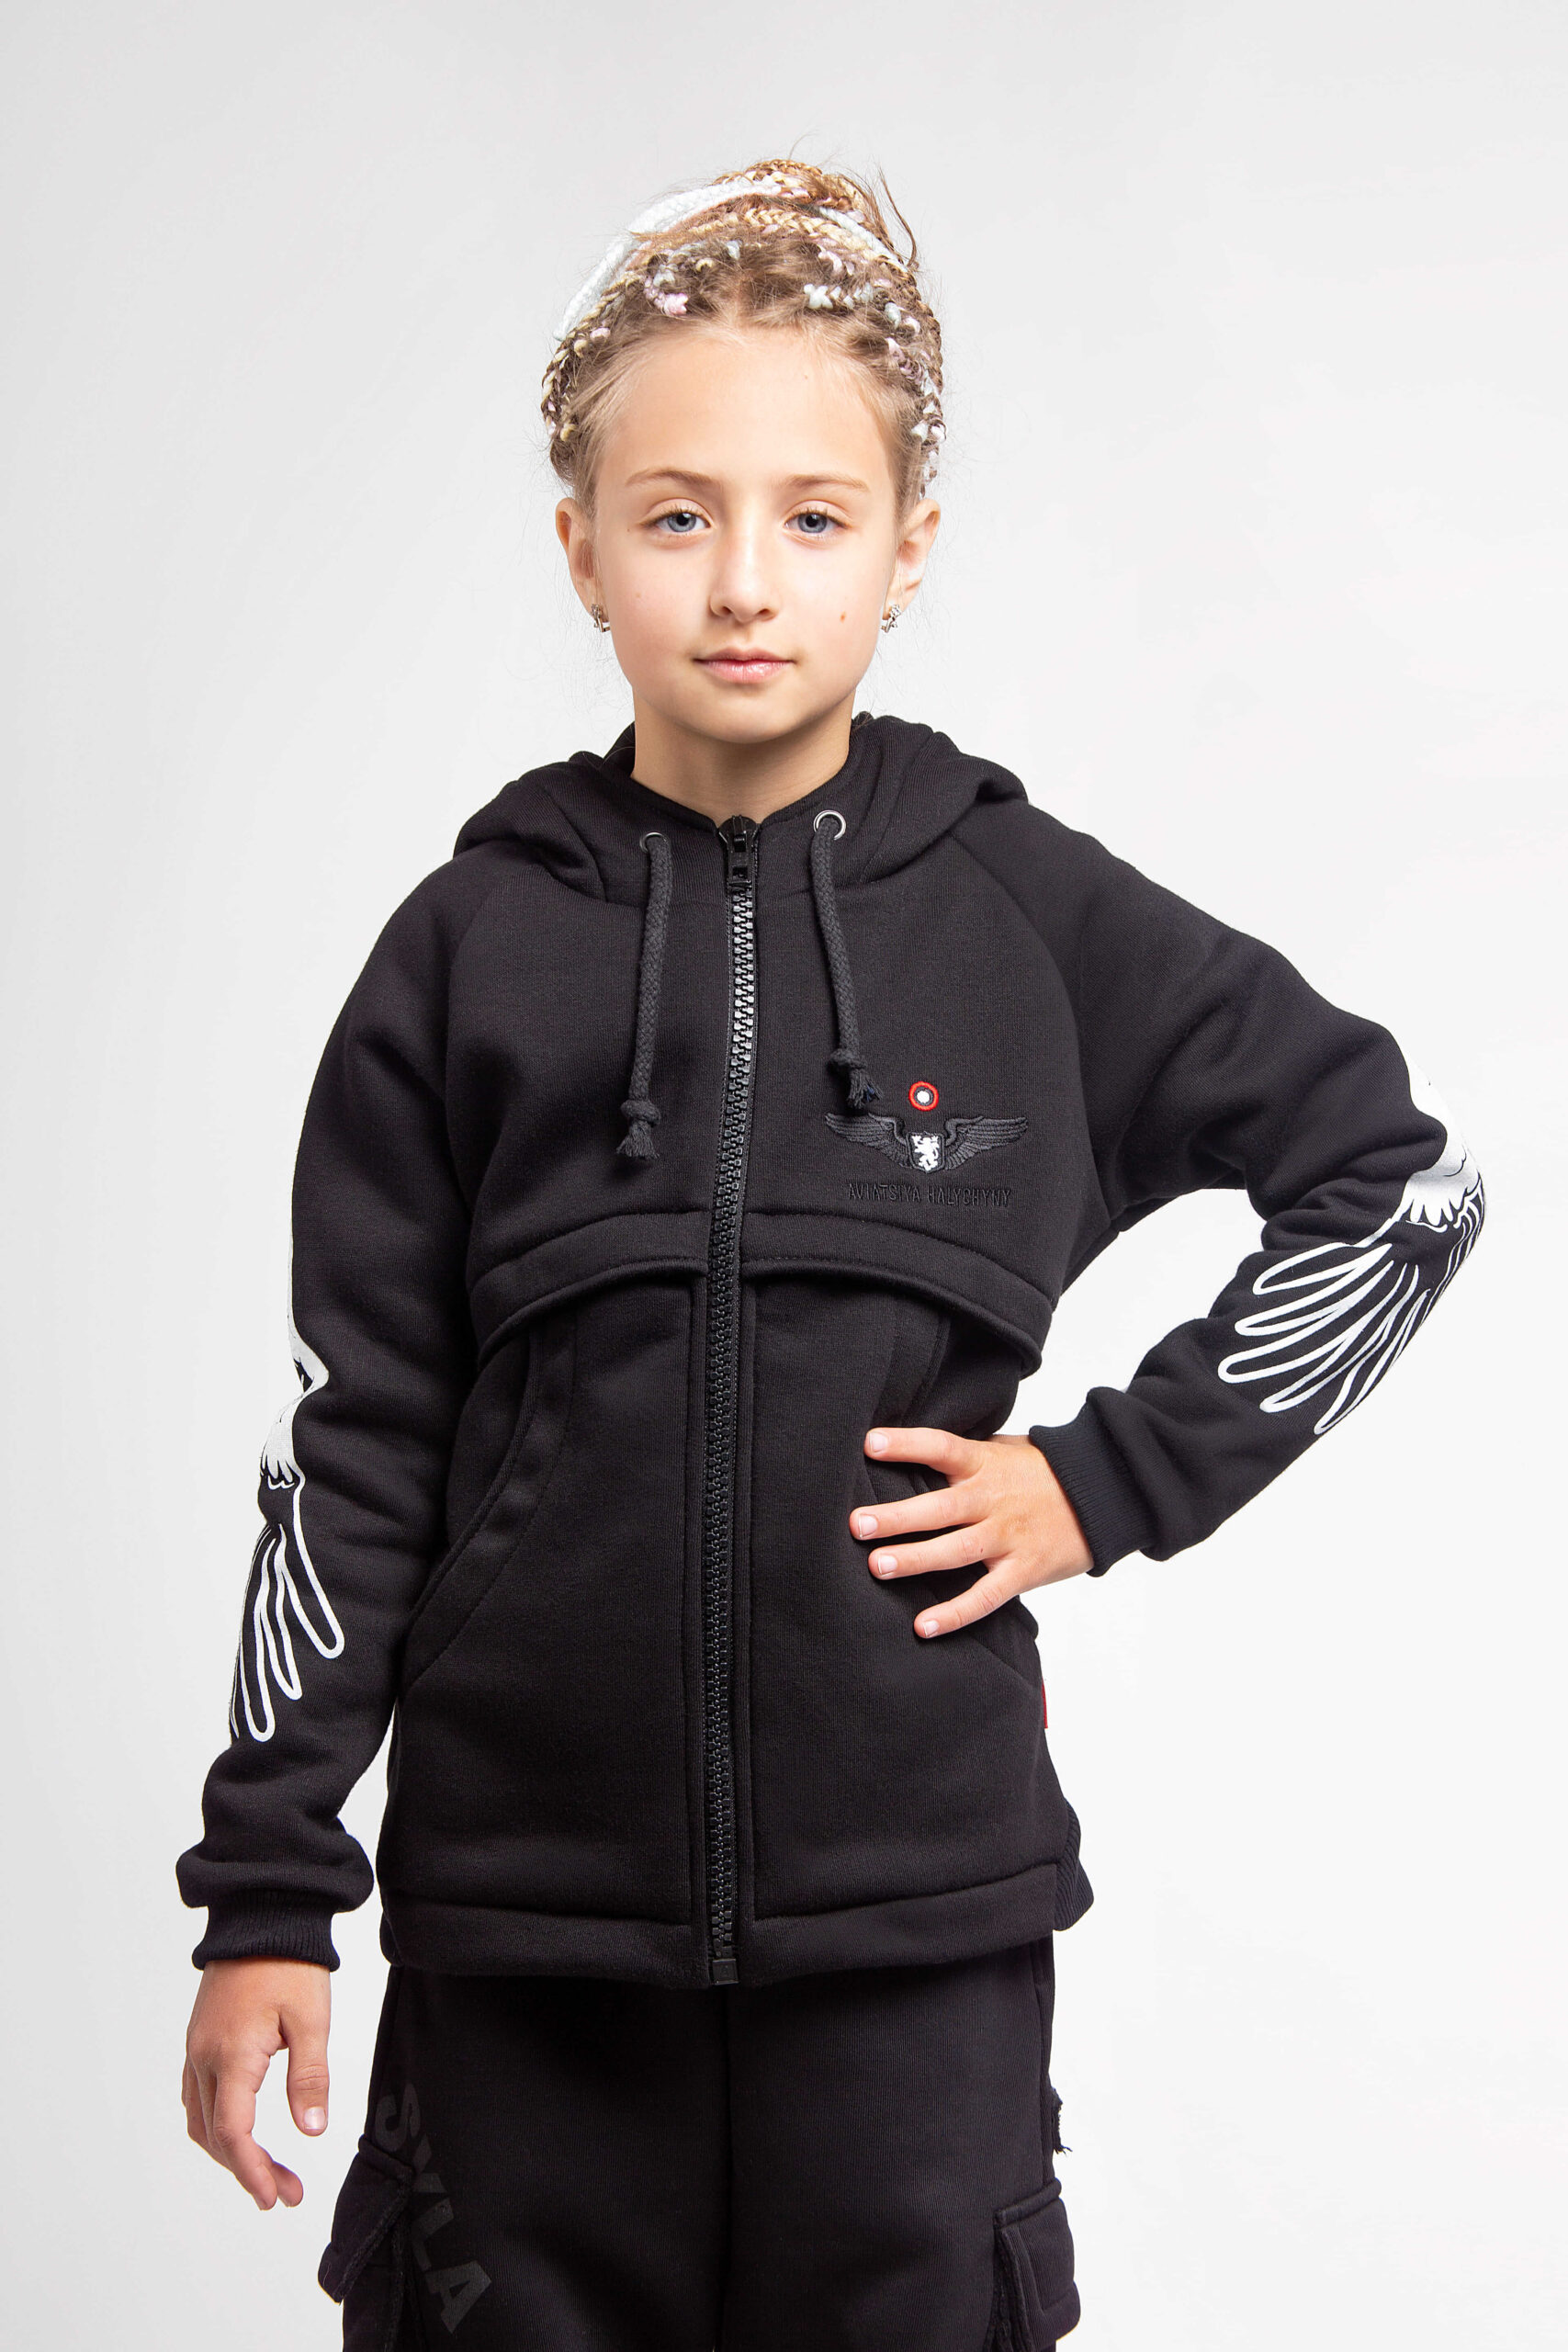 Kids Hoodie Stork. Color black. Hoodie: unisex, well suited for both boys and girls.